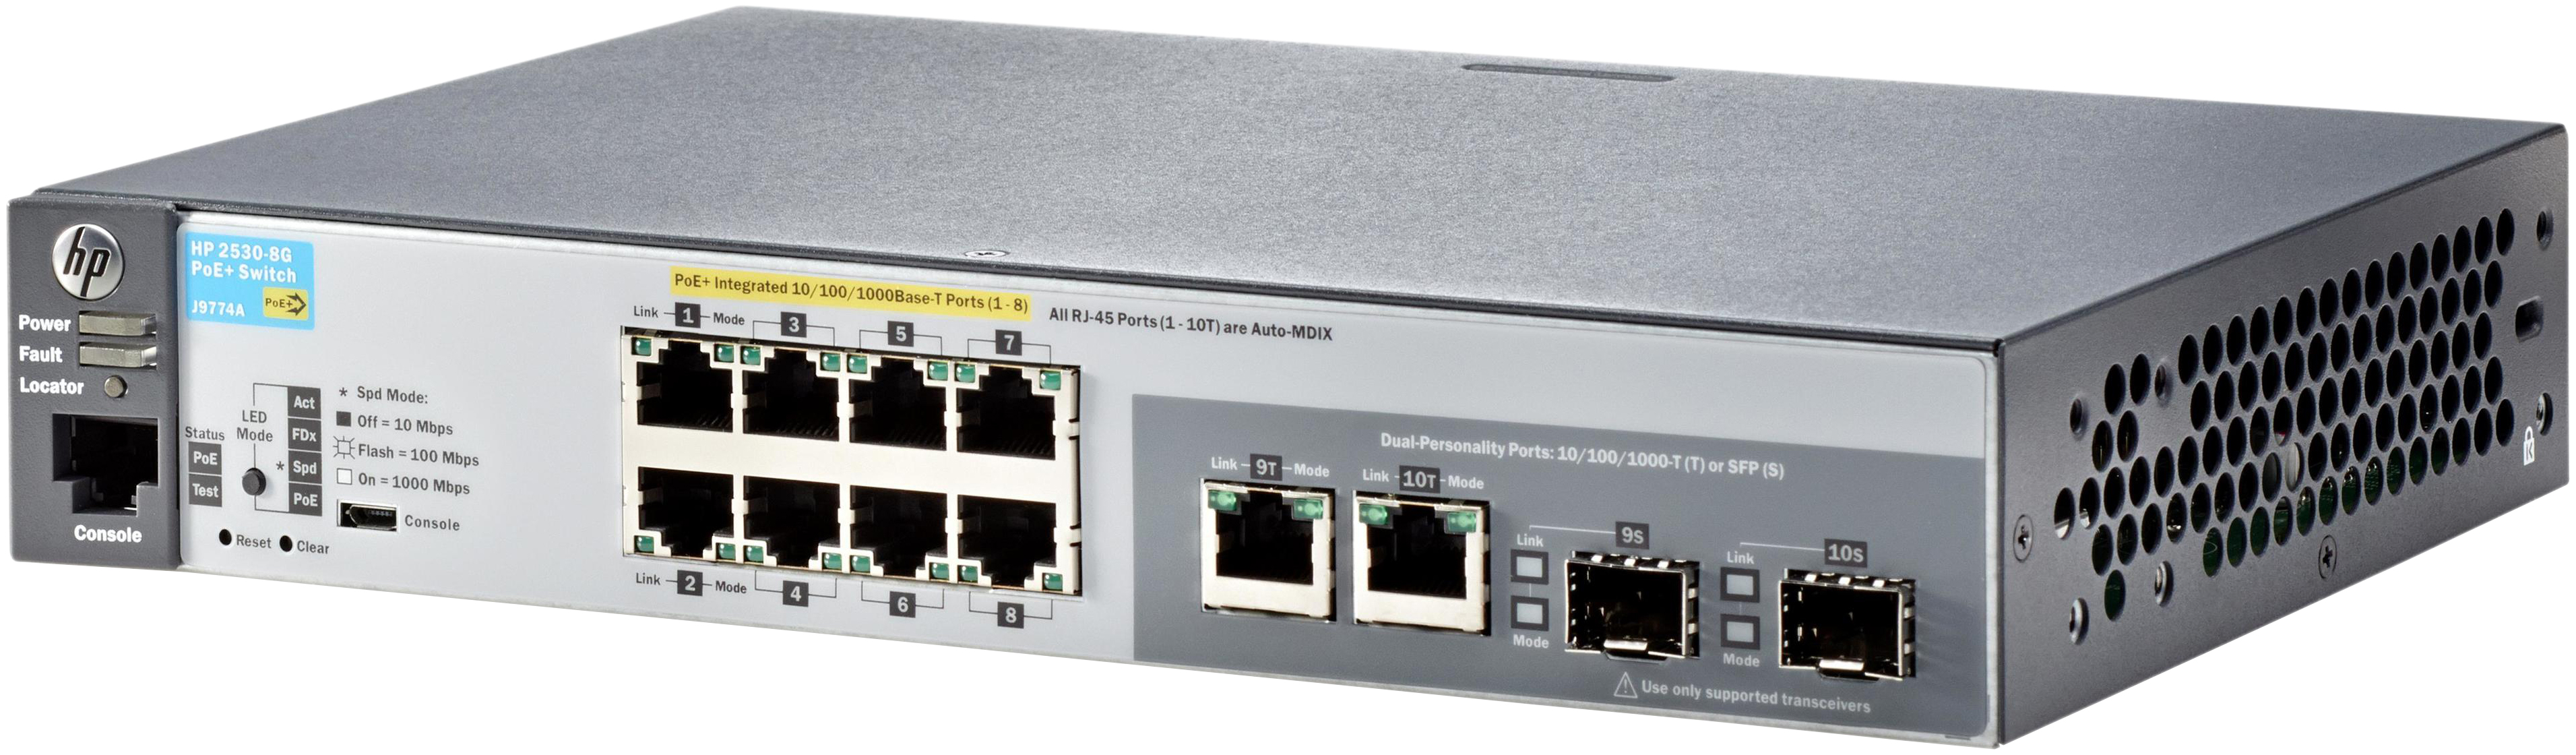 Коммутатор HP Aruba 2530 8G PoE+ J9774A